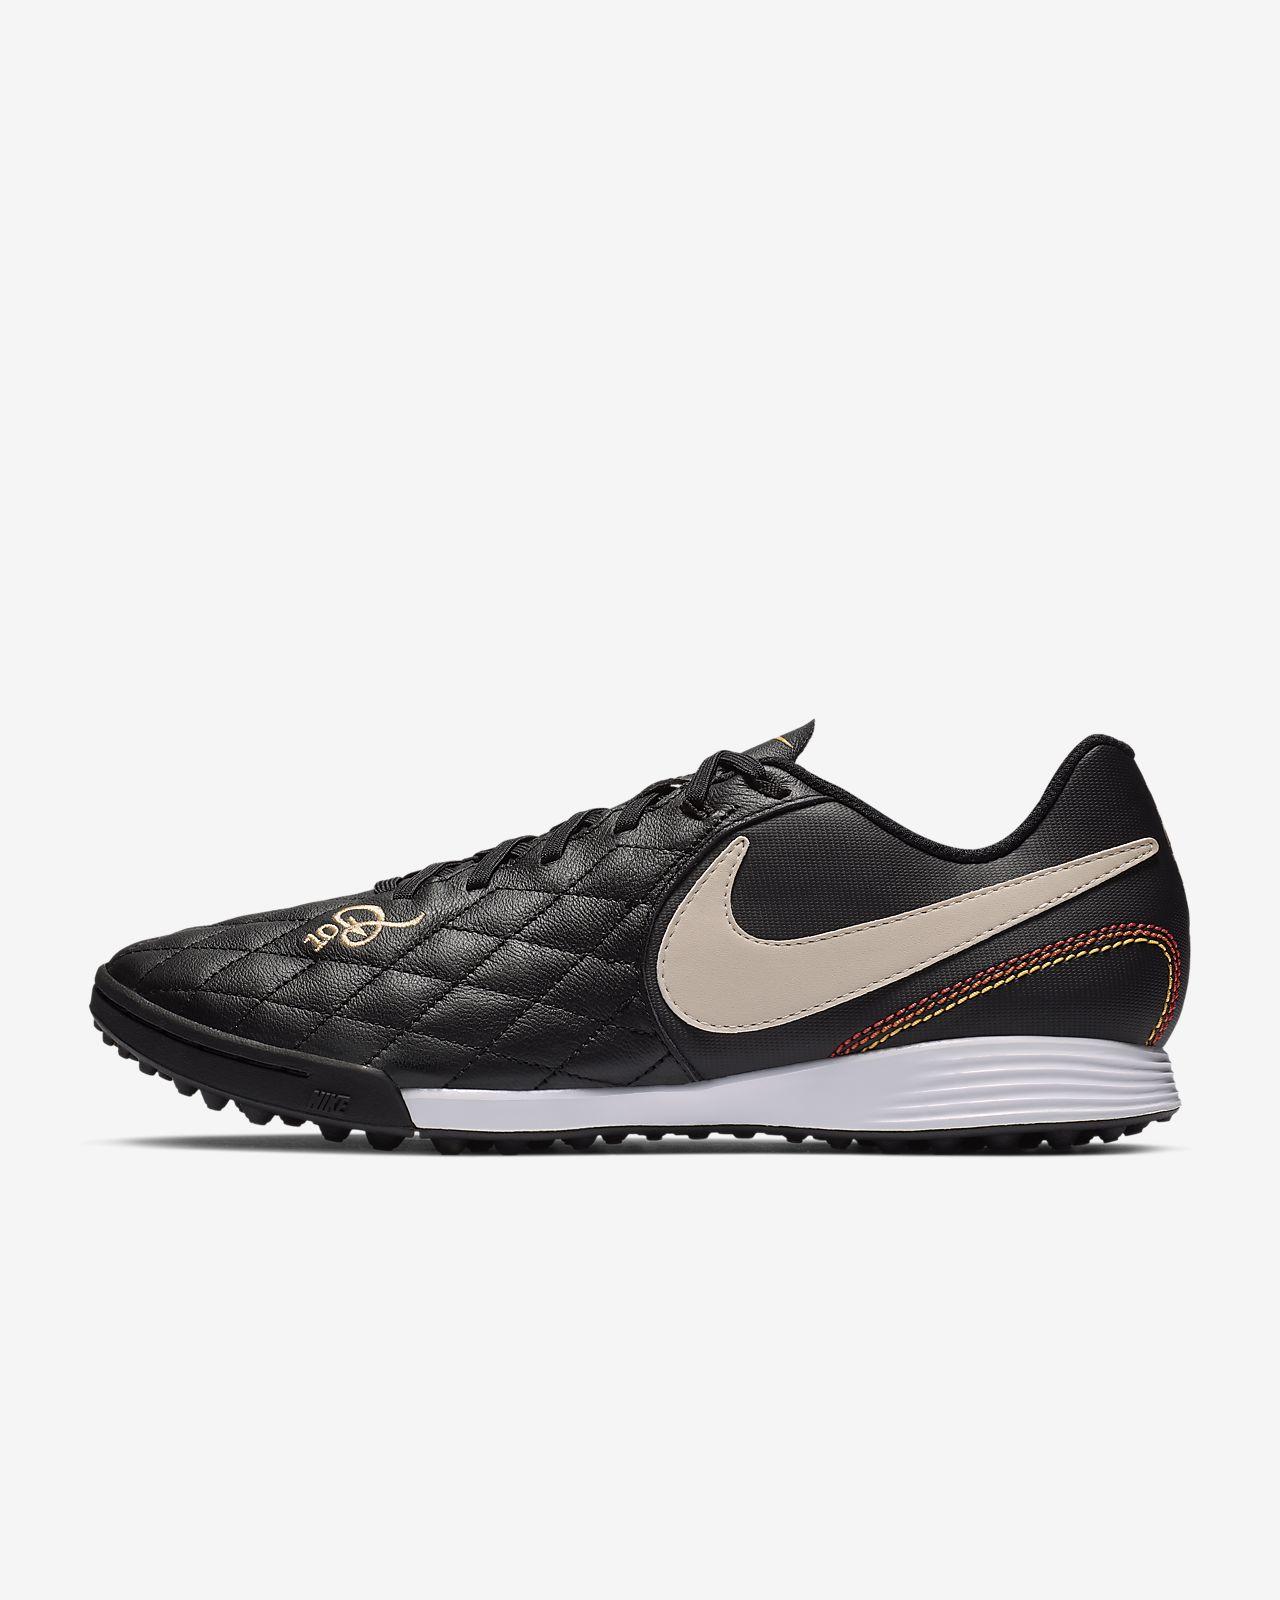 Chaussure de football pour surface synthétique Nike TiempoX Legend VII Academy 10R